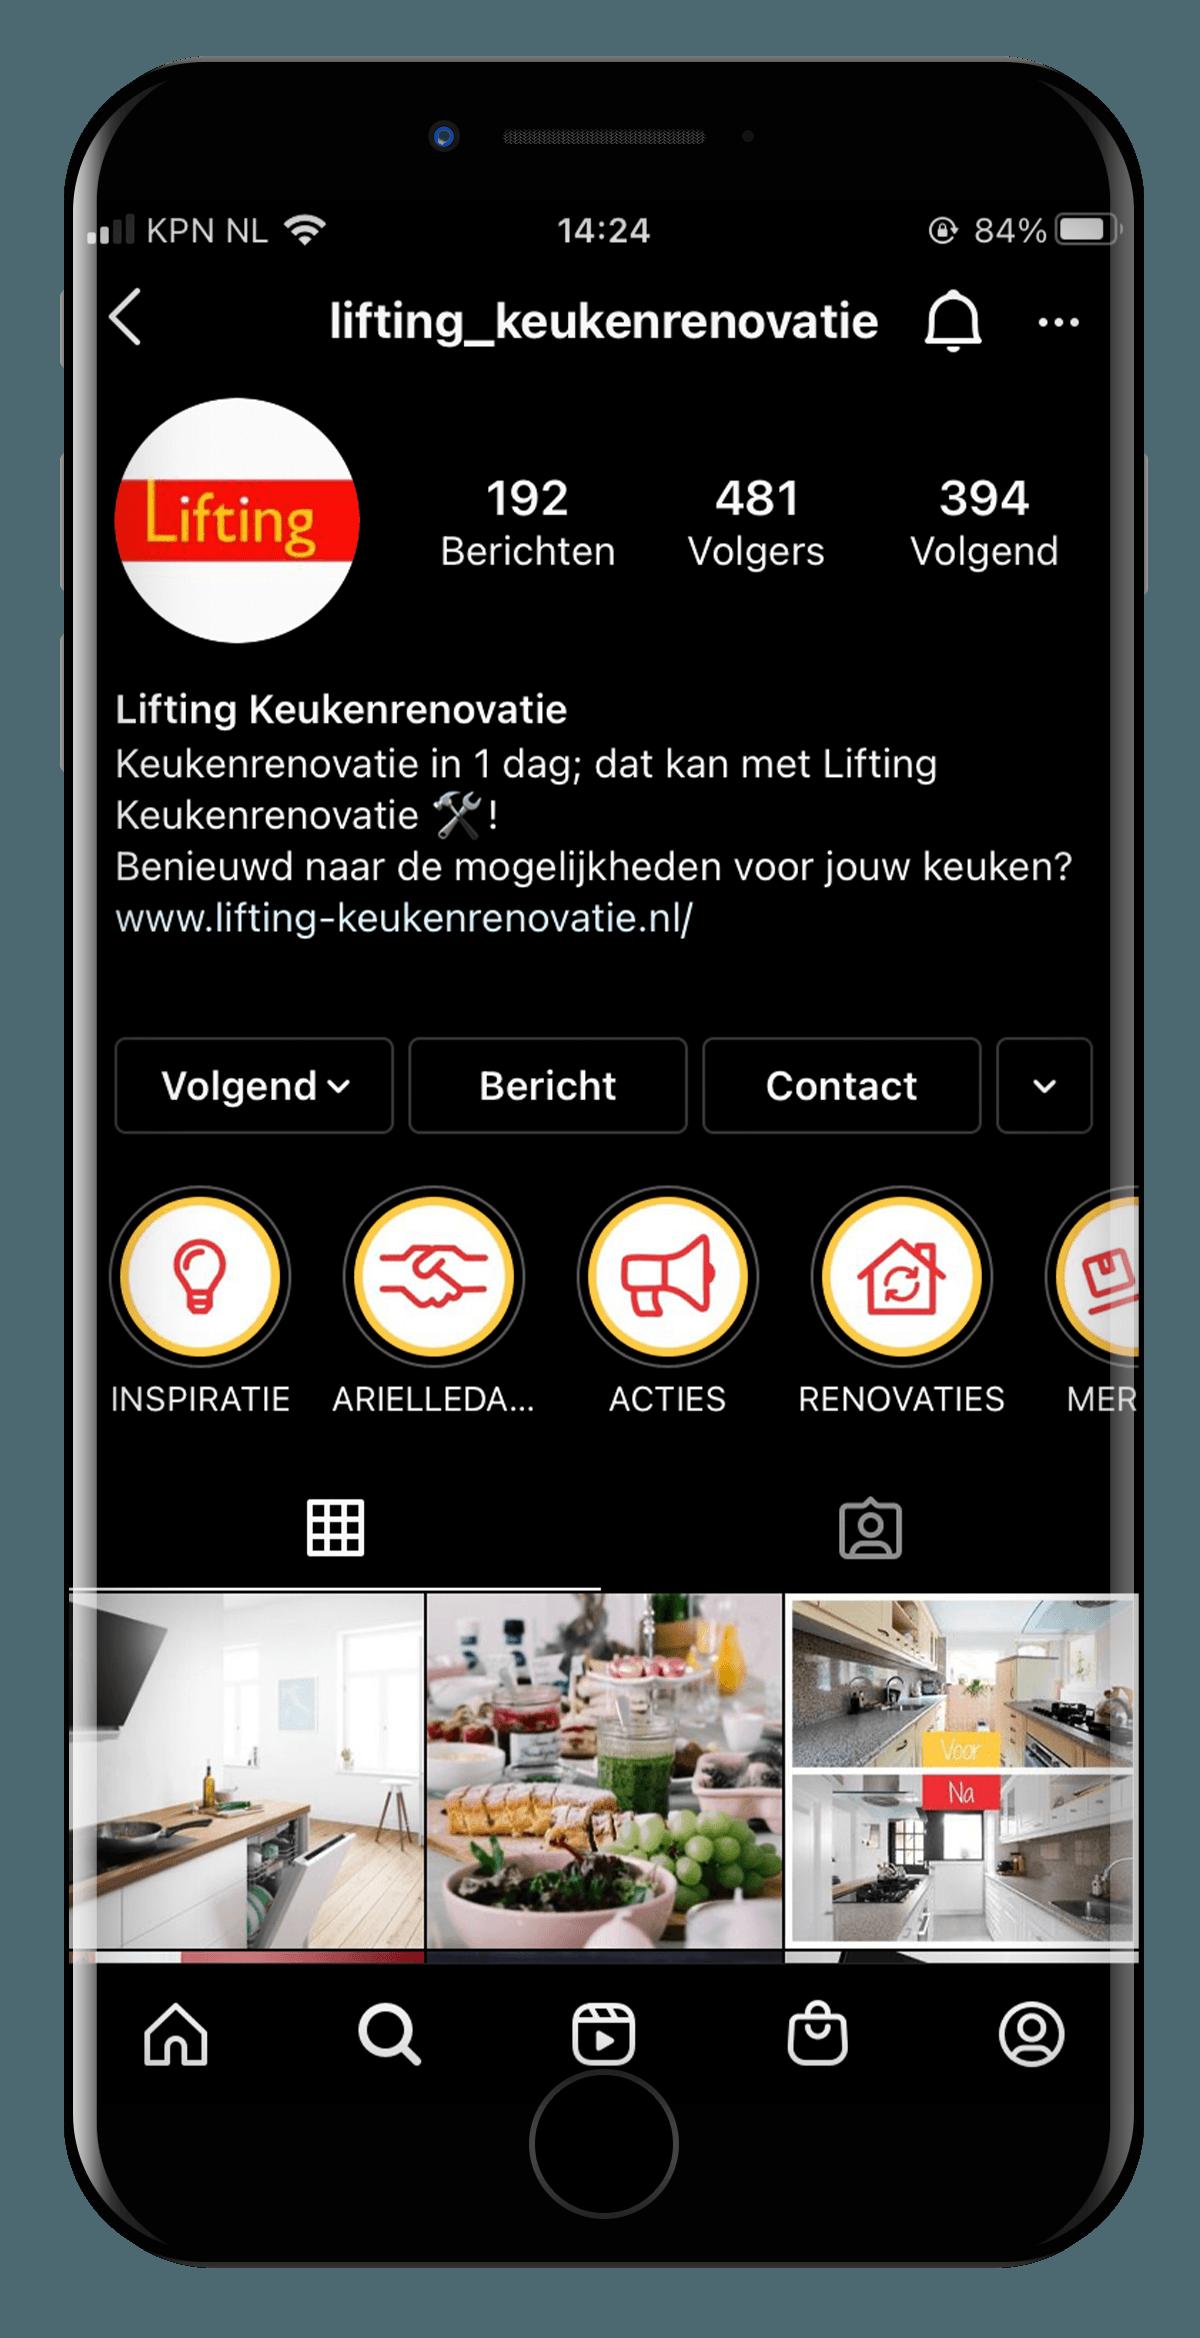 SociaLLien-made-marketing-liftingkeukens-instagram